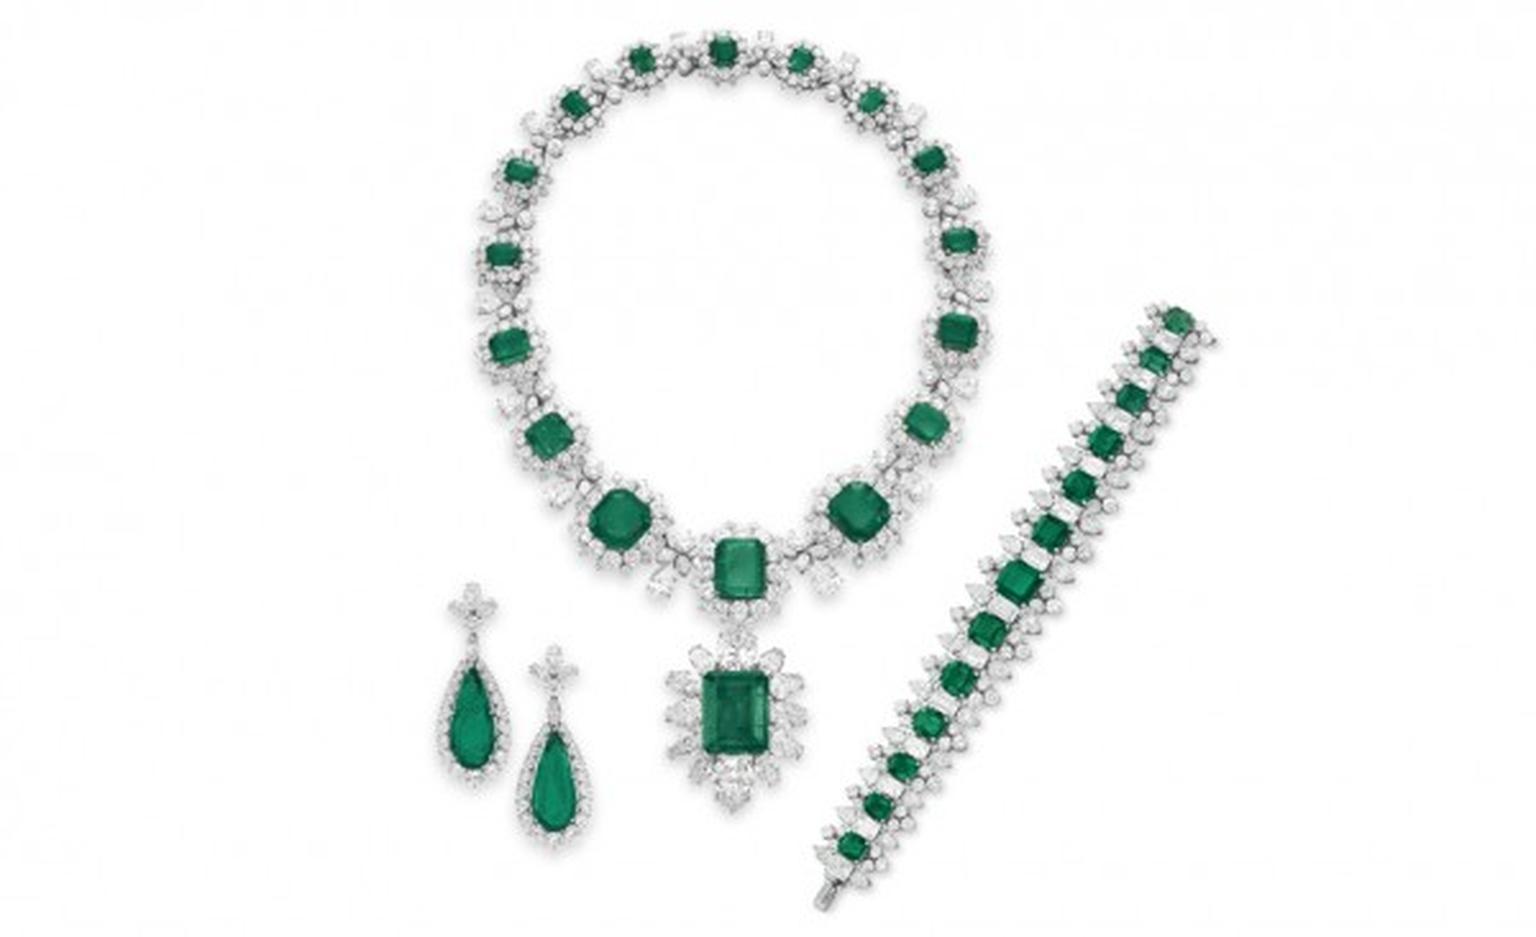 Elizabeth Taylor Bulgari Emerald And Diamond Jewelry Collection